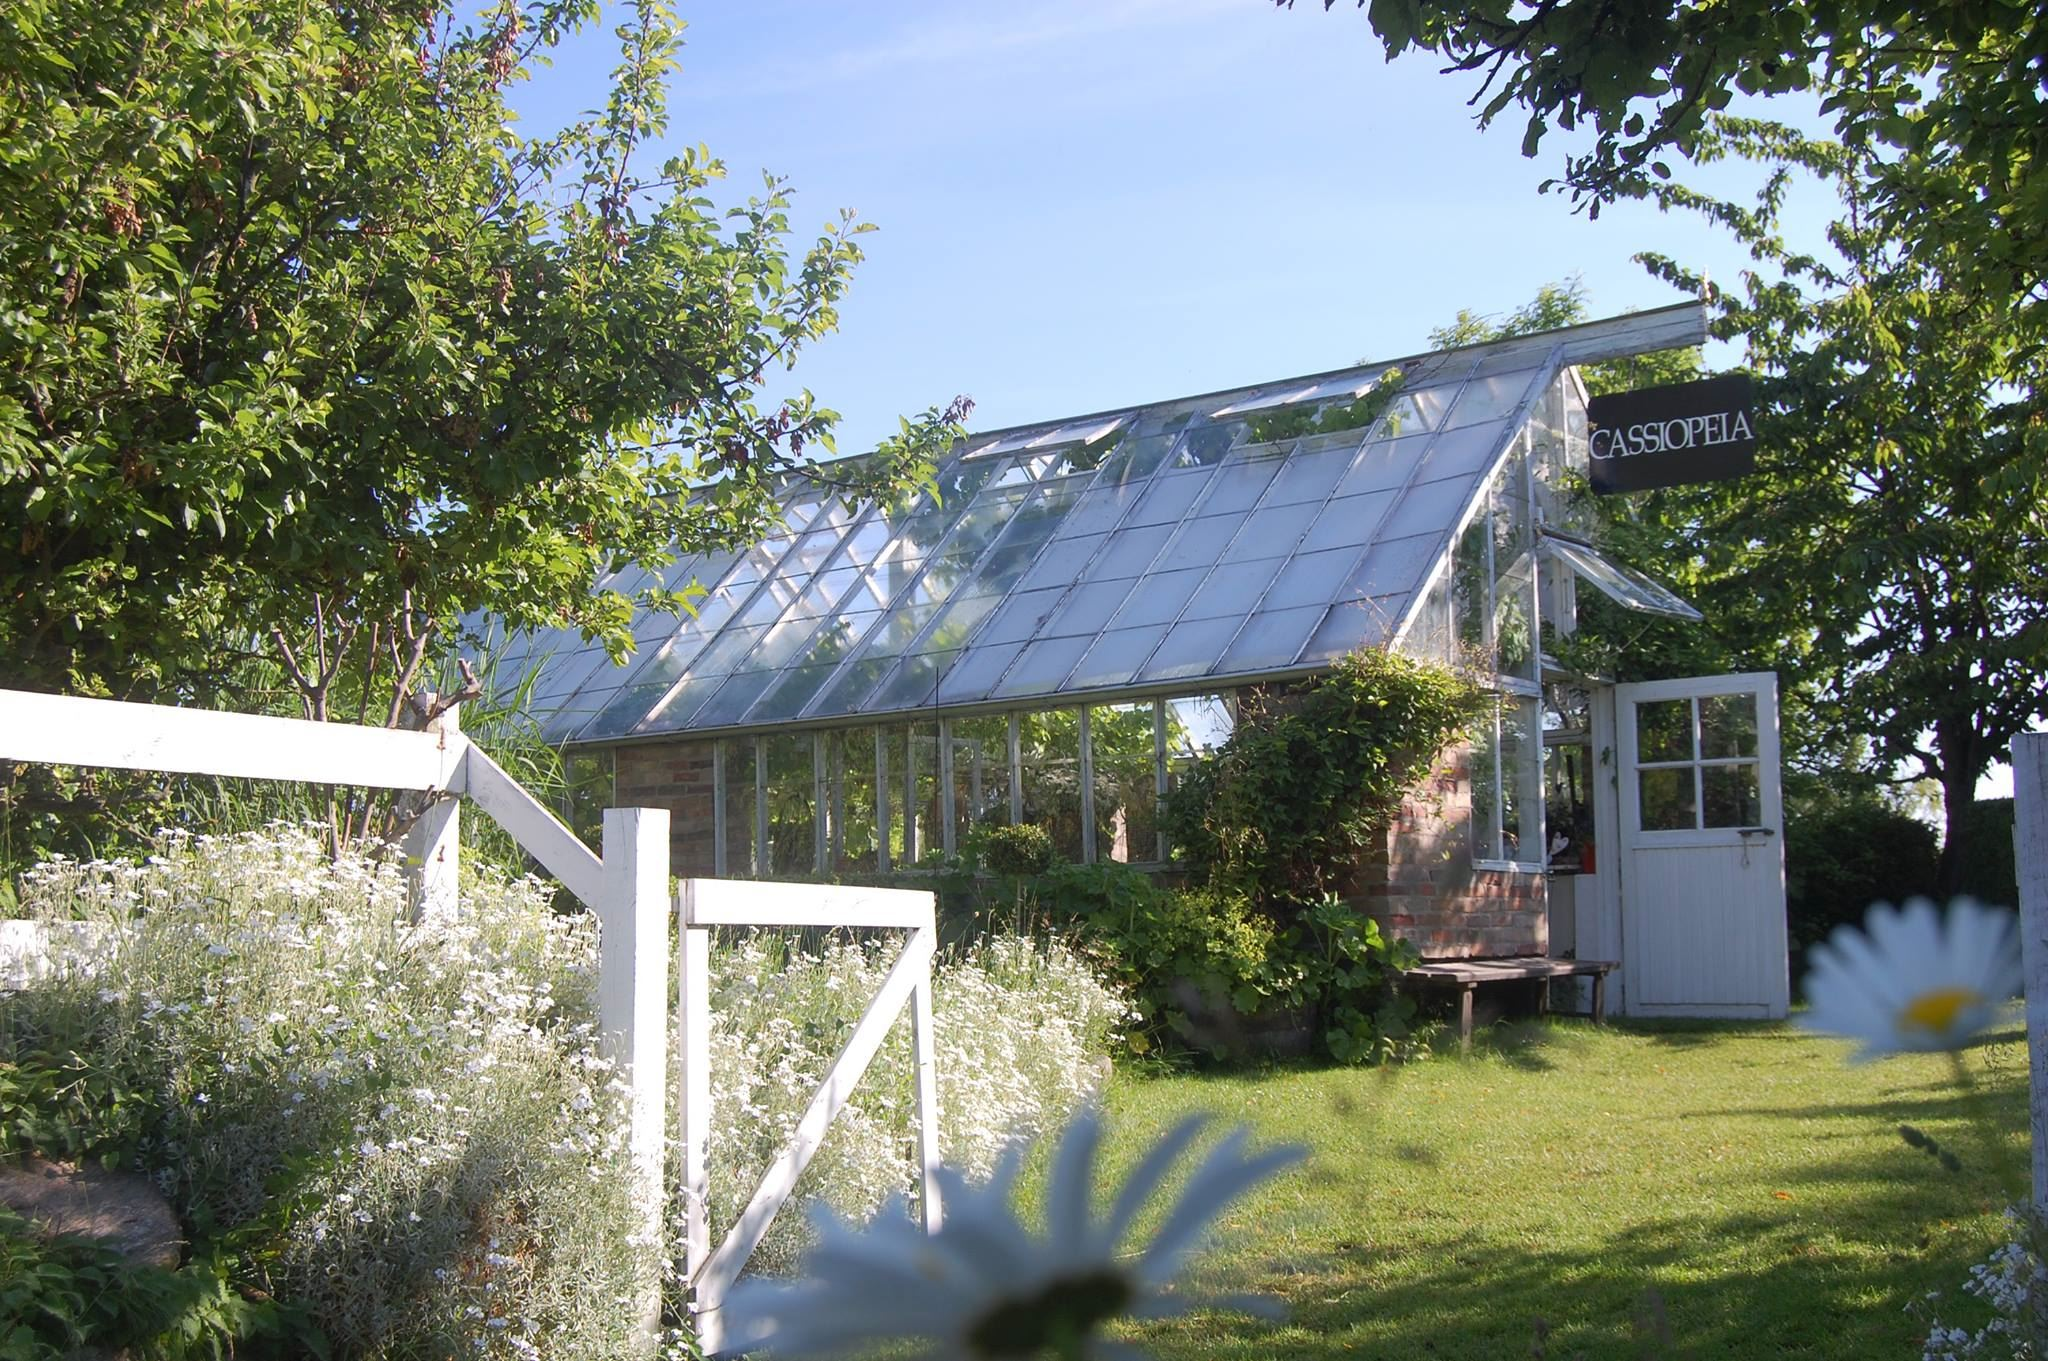 Cassiopeia trädgårdsgalleri-Ven